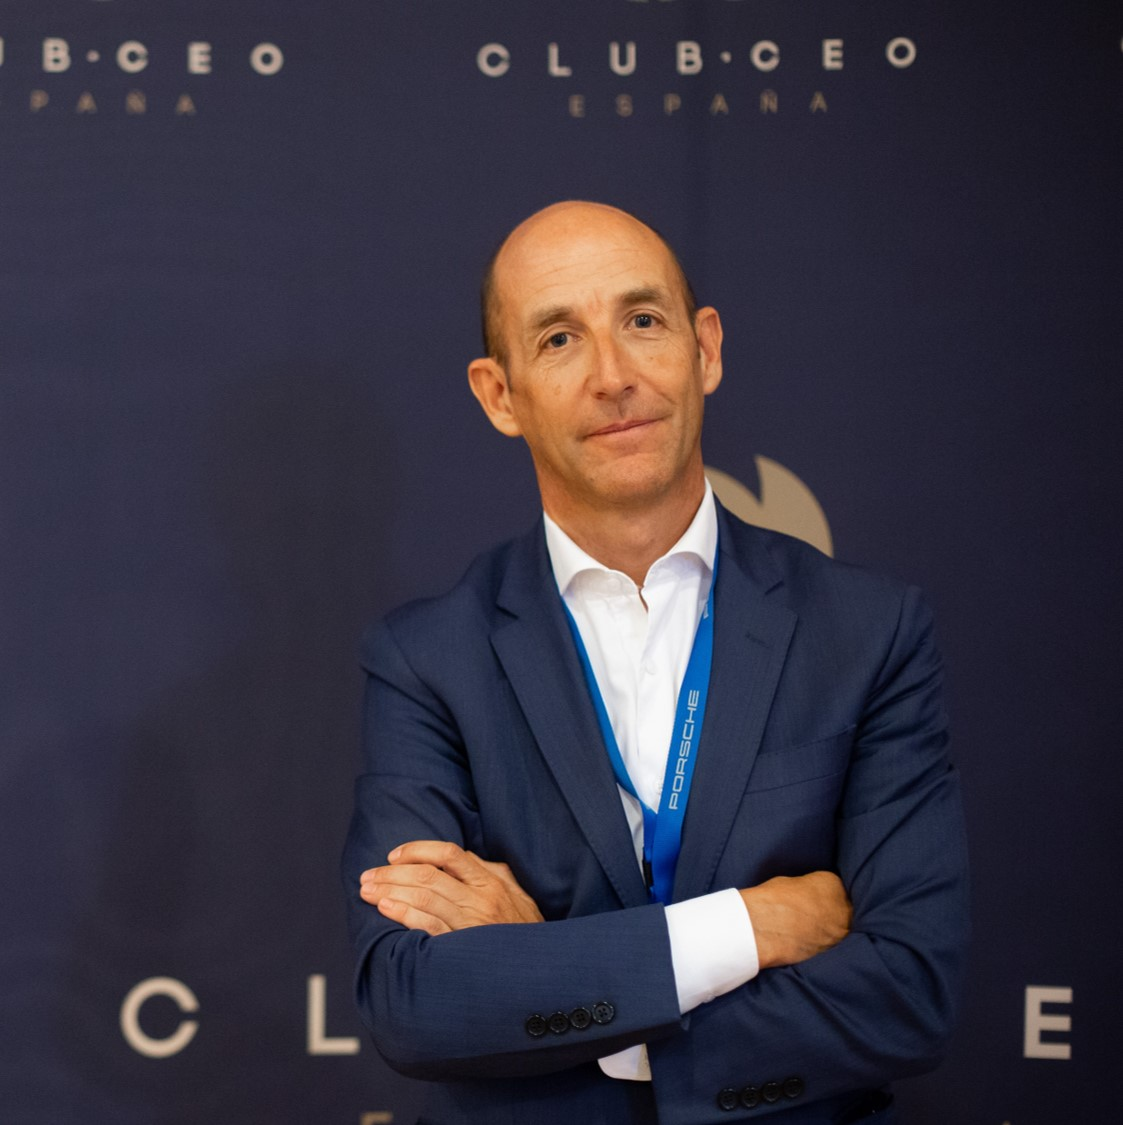 DANIEL CARREÑO